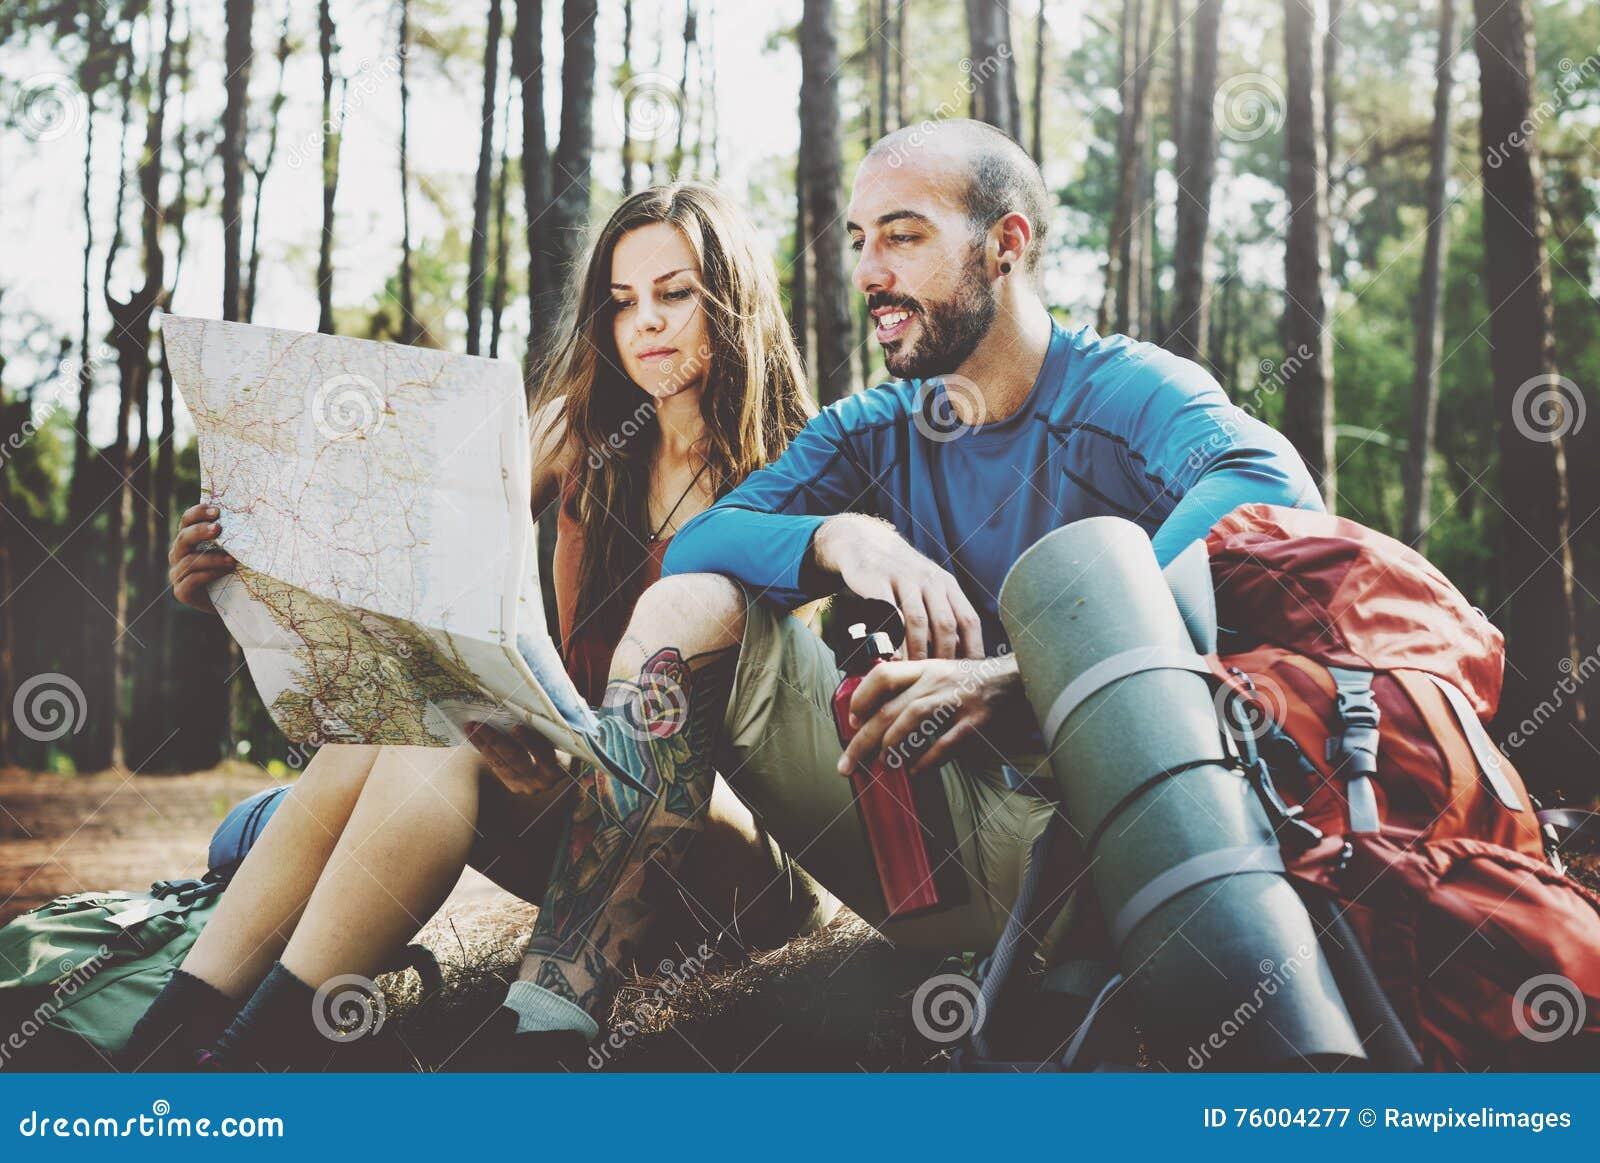 Lager-Forest Adventure Travel Remote Relax-Konzept